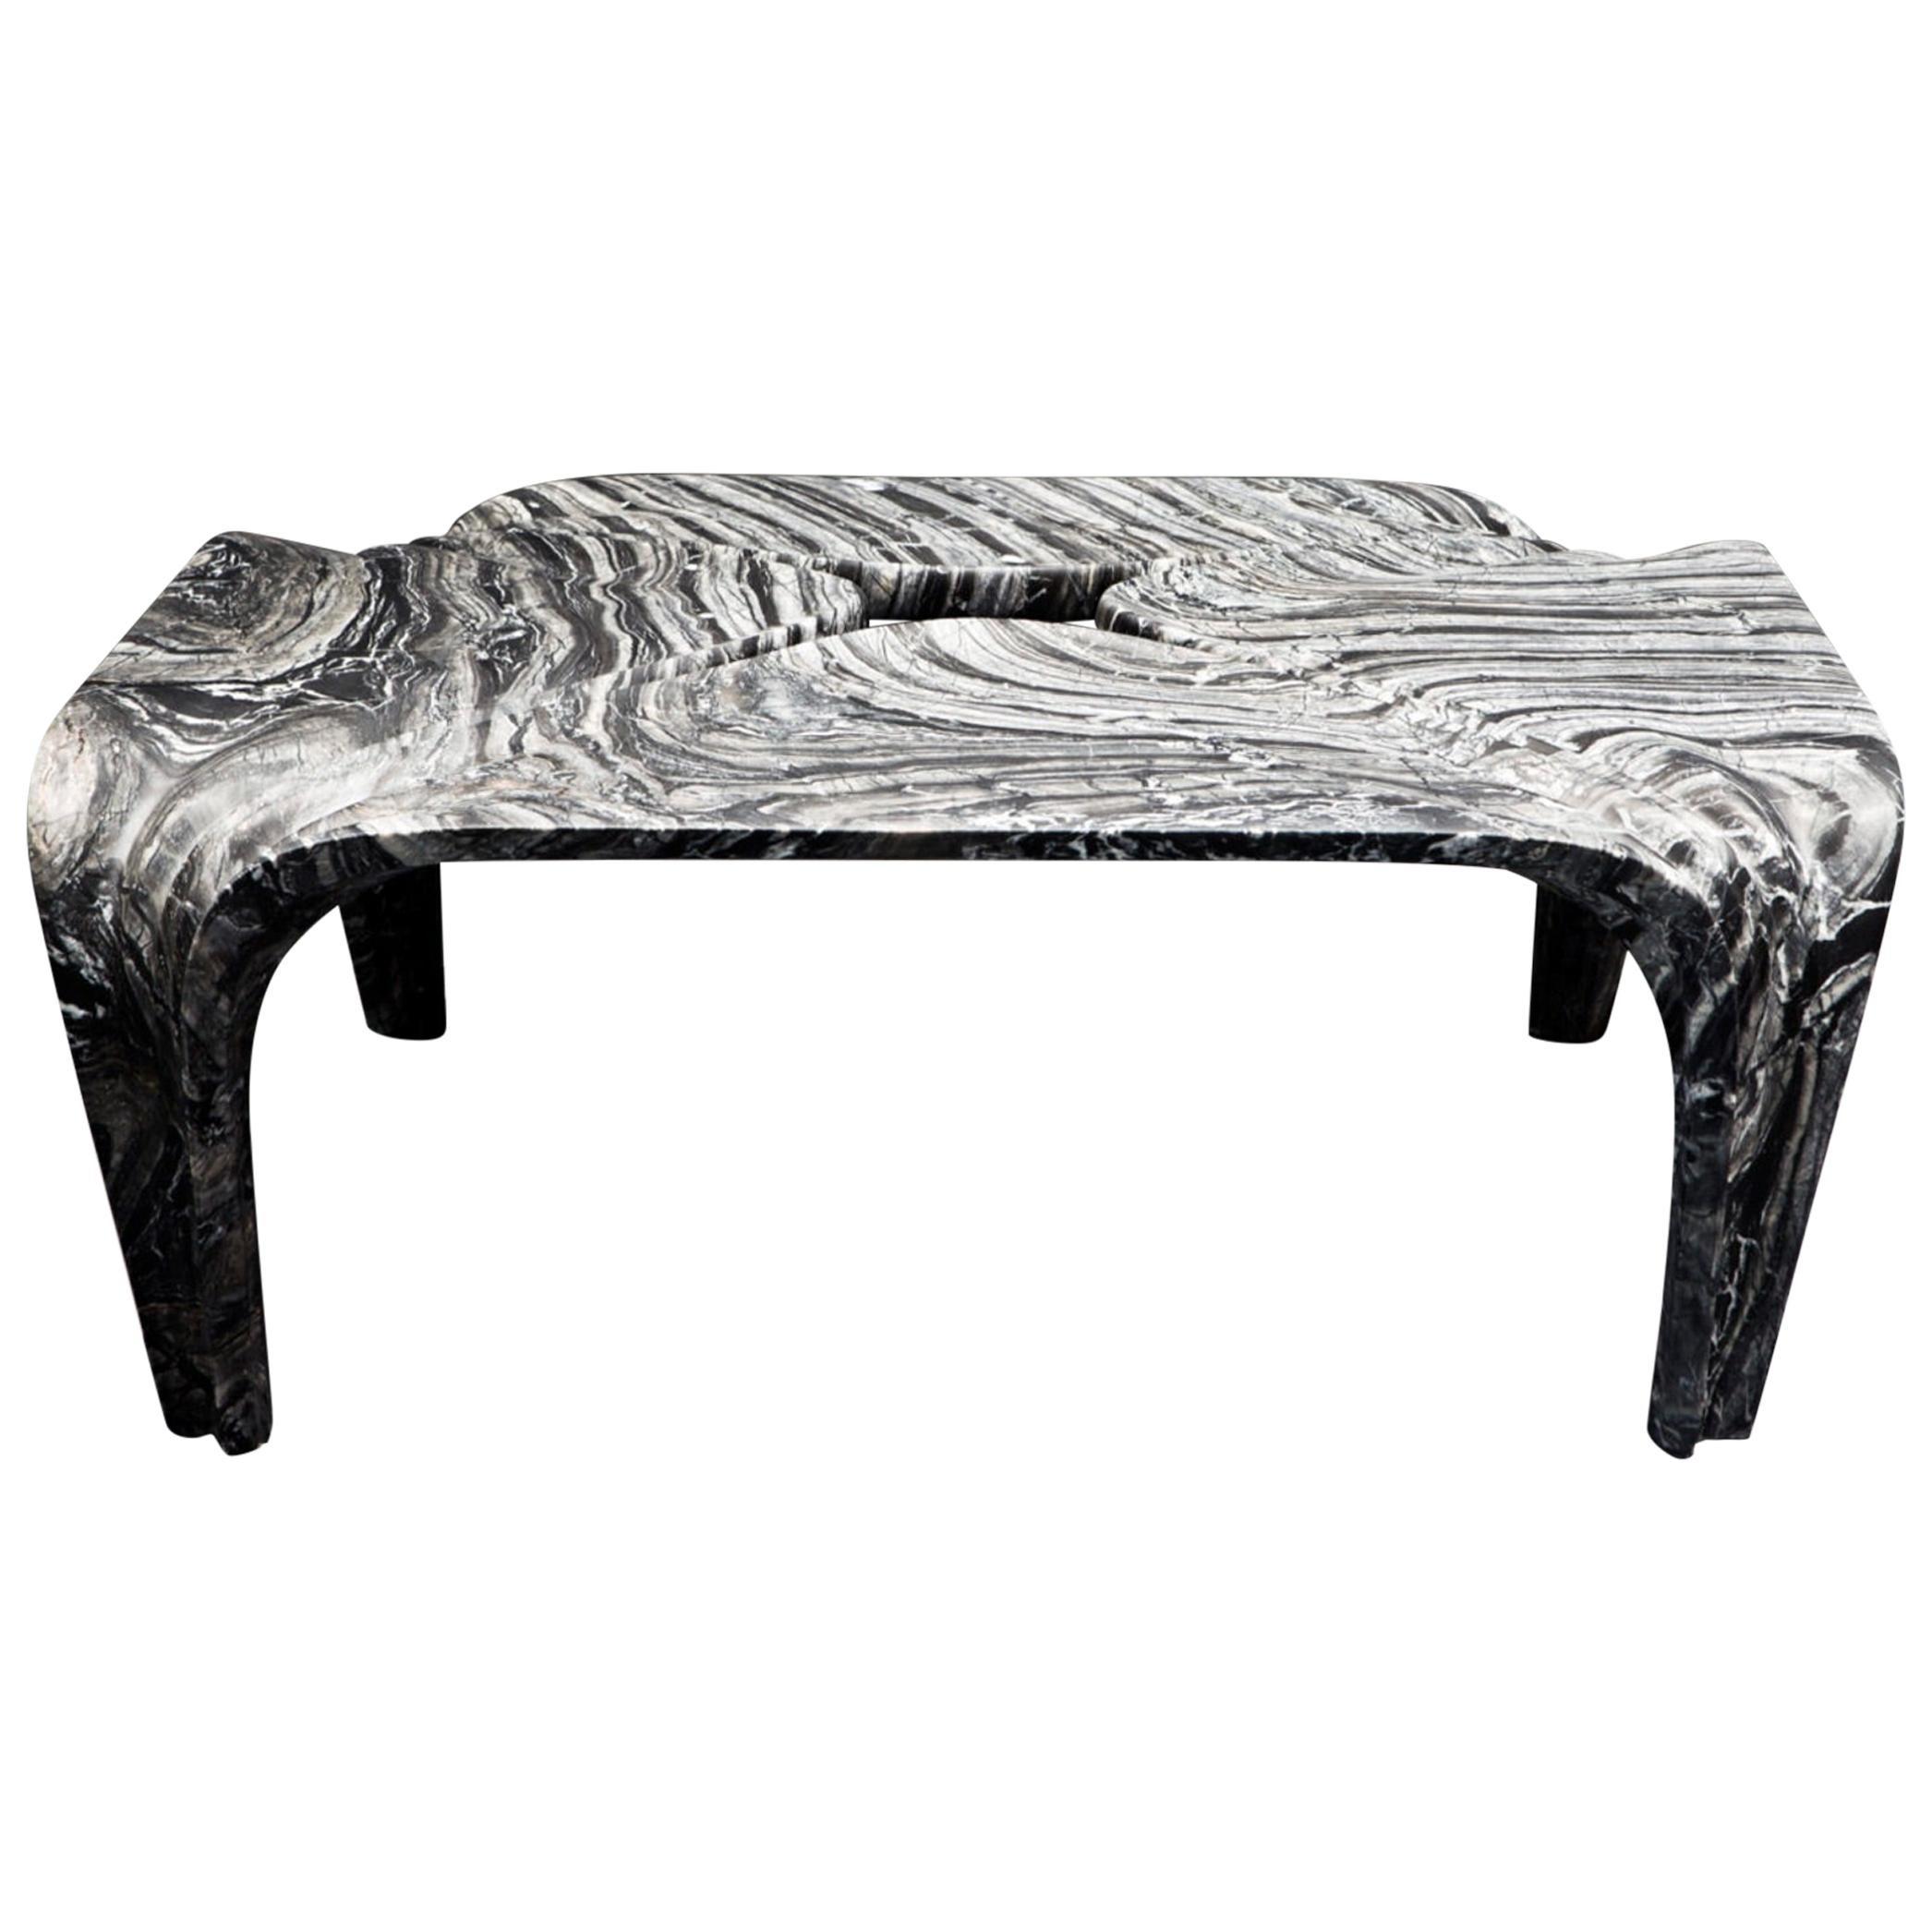 Contemporary Italian Marble Coffee Table Designed by Zaha Hadid